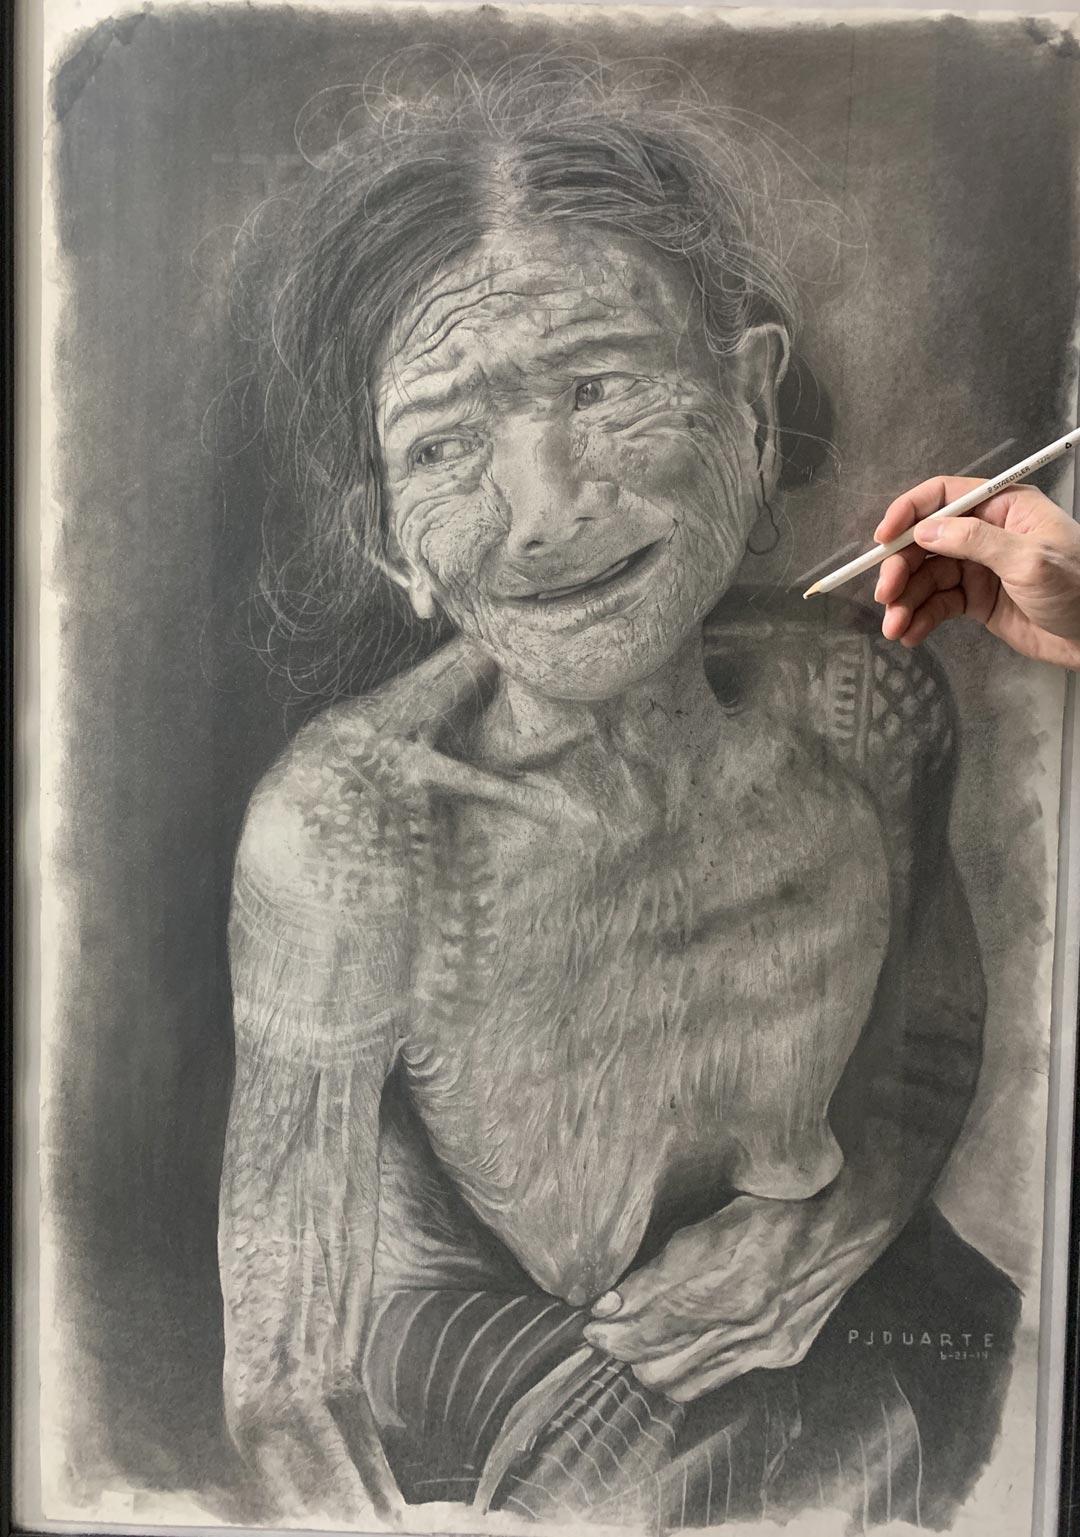 Kalinga Tribal Woman by Peter Duarte